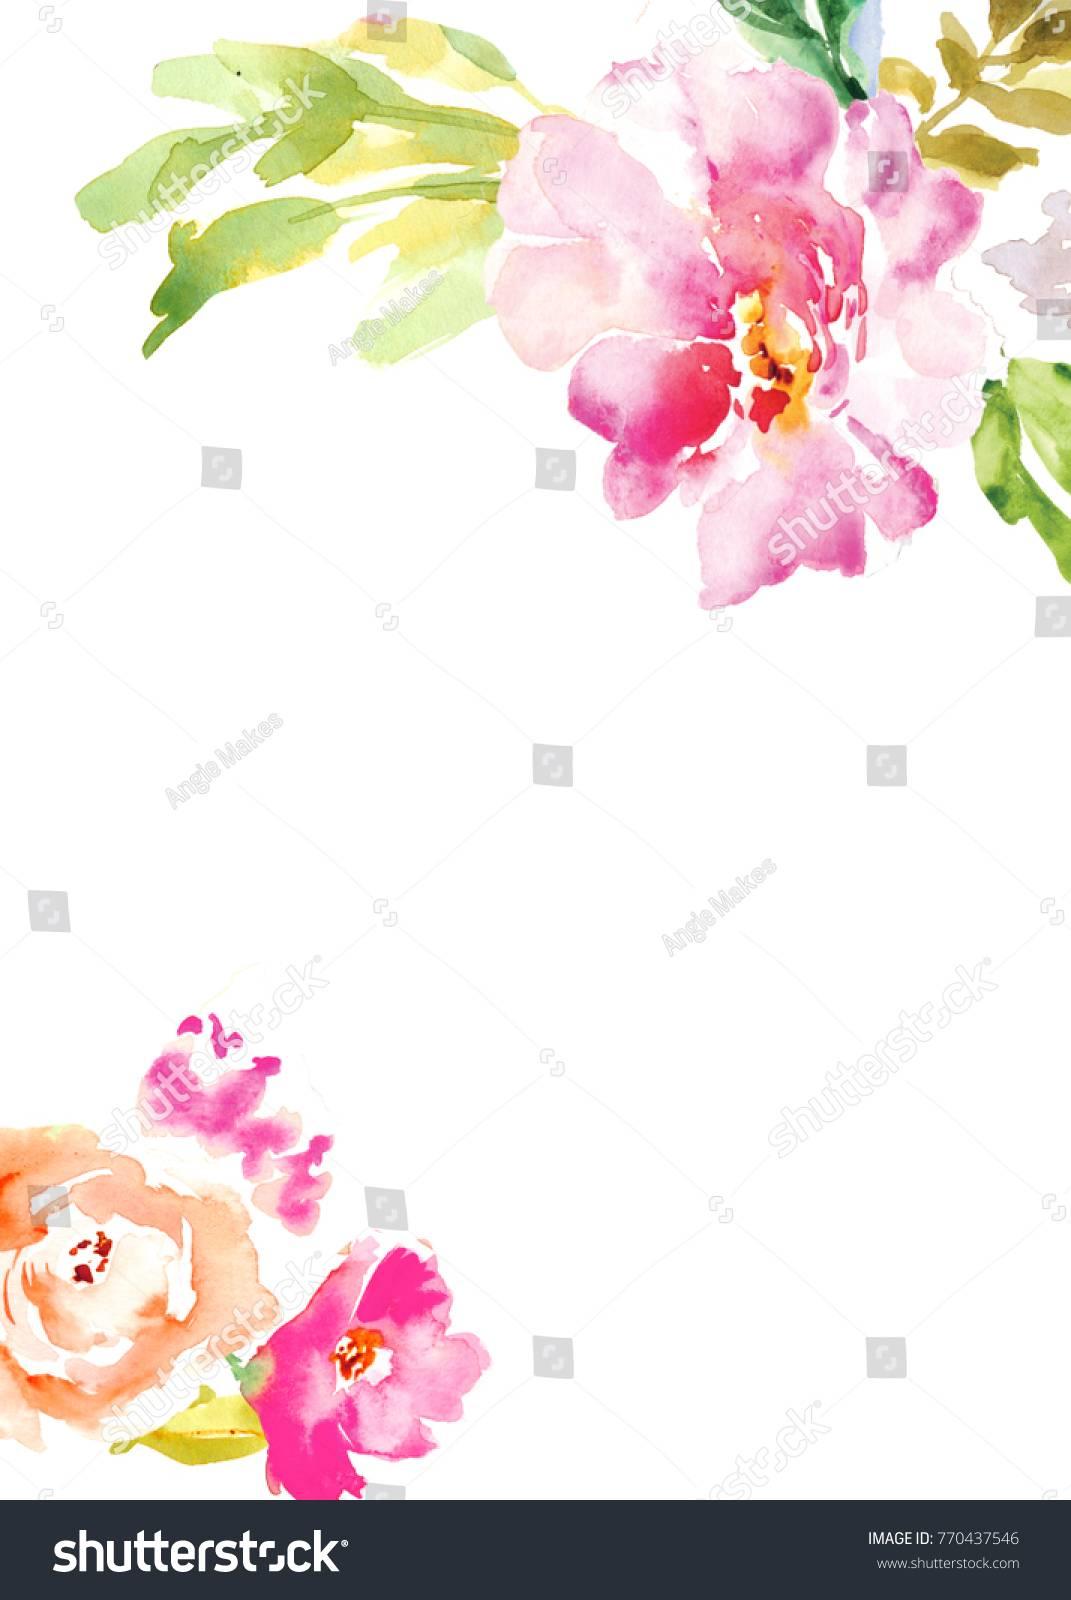 Watercolor Flower Invitation Template